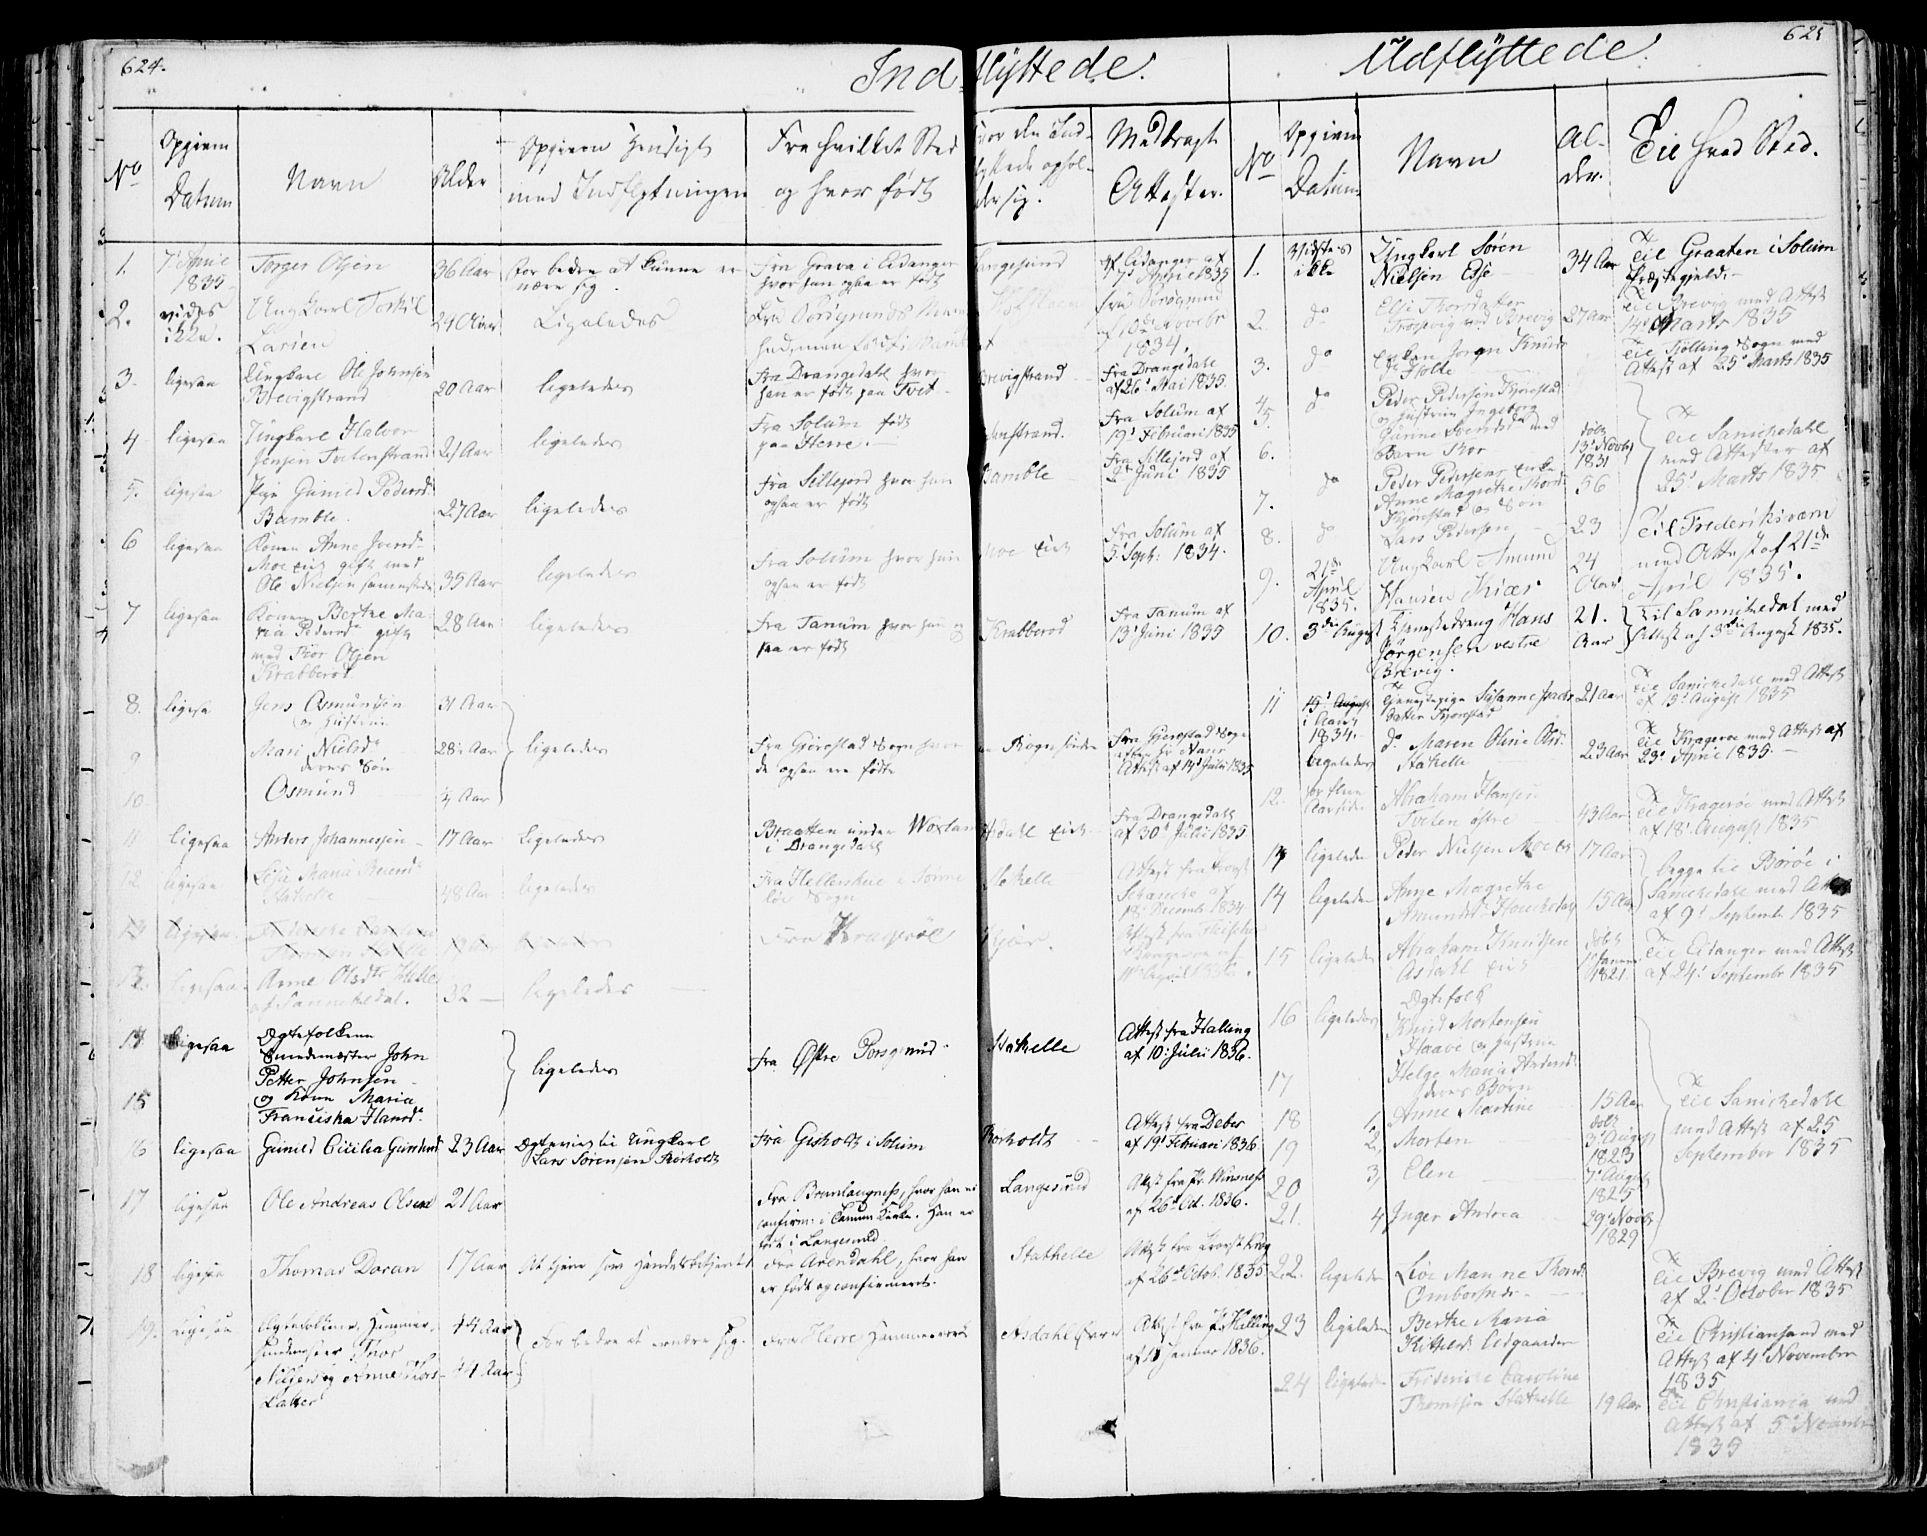 SAKO, Bamble kirkebøker, F/Fa/L0004: Ministerialbok nr. I 4, 1834-1853, s. 624-625